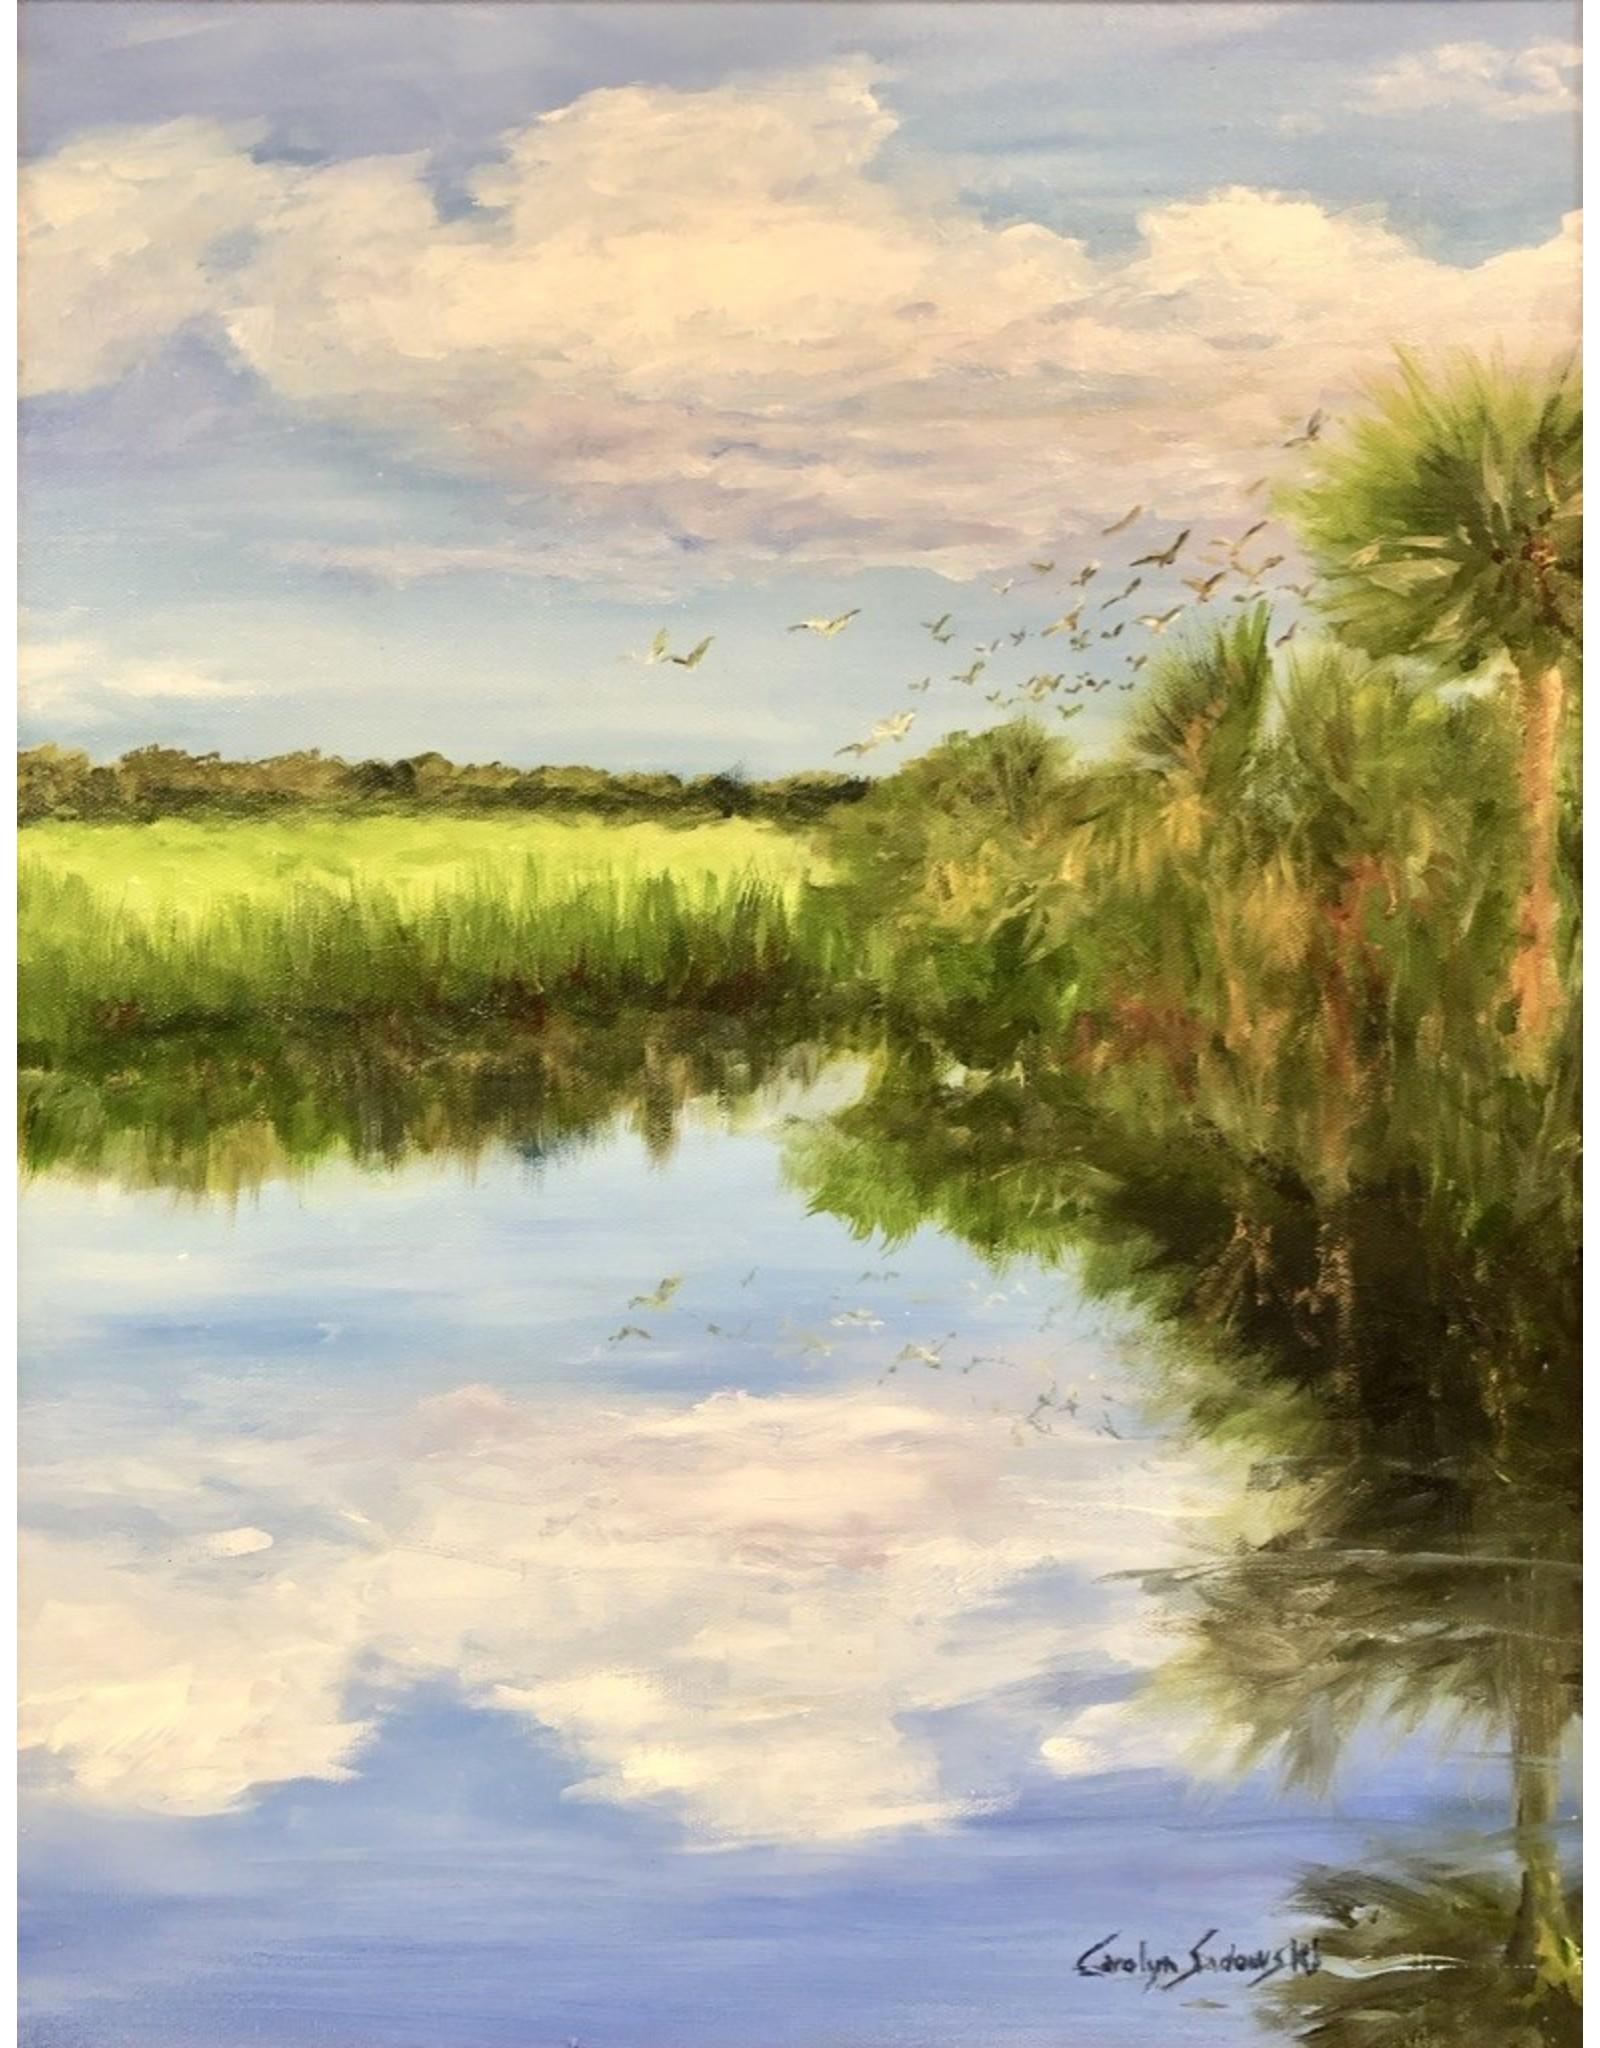 Carolyn Sadowski In The Glades (Original Oil, Framed, Signed, 14x18)